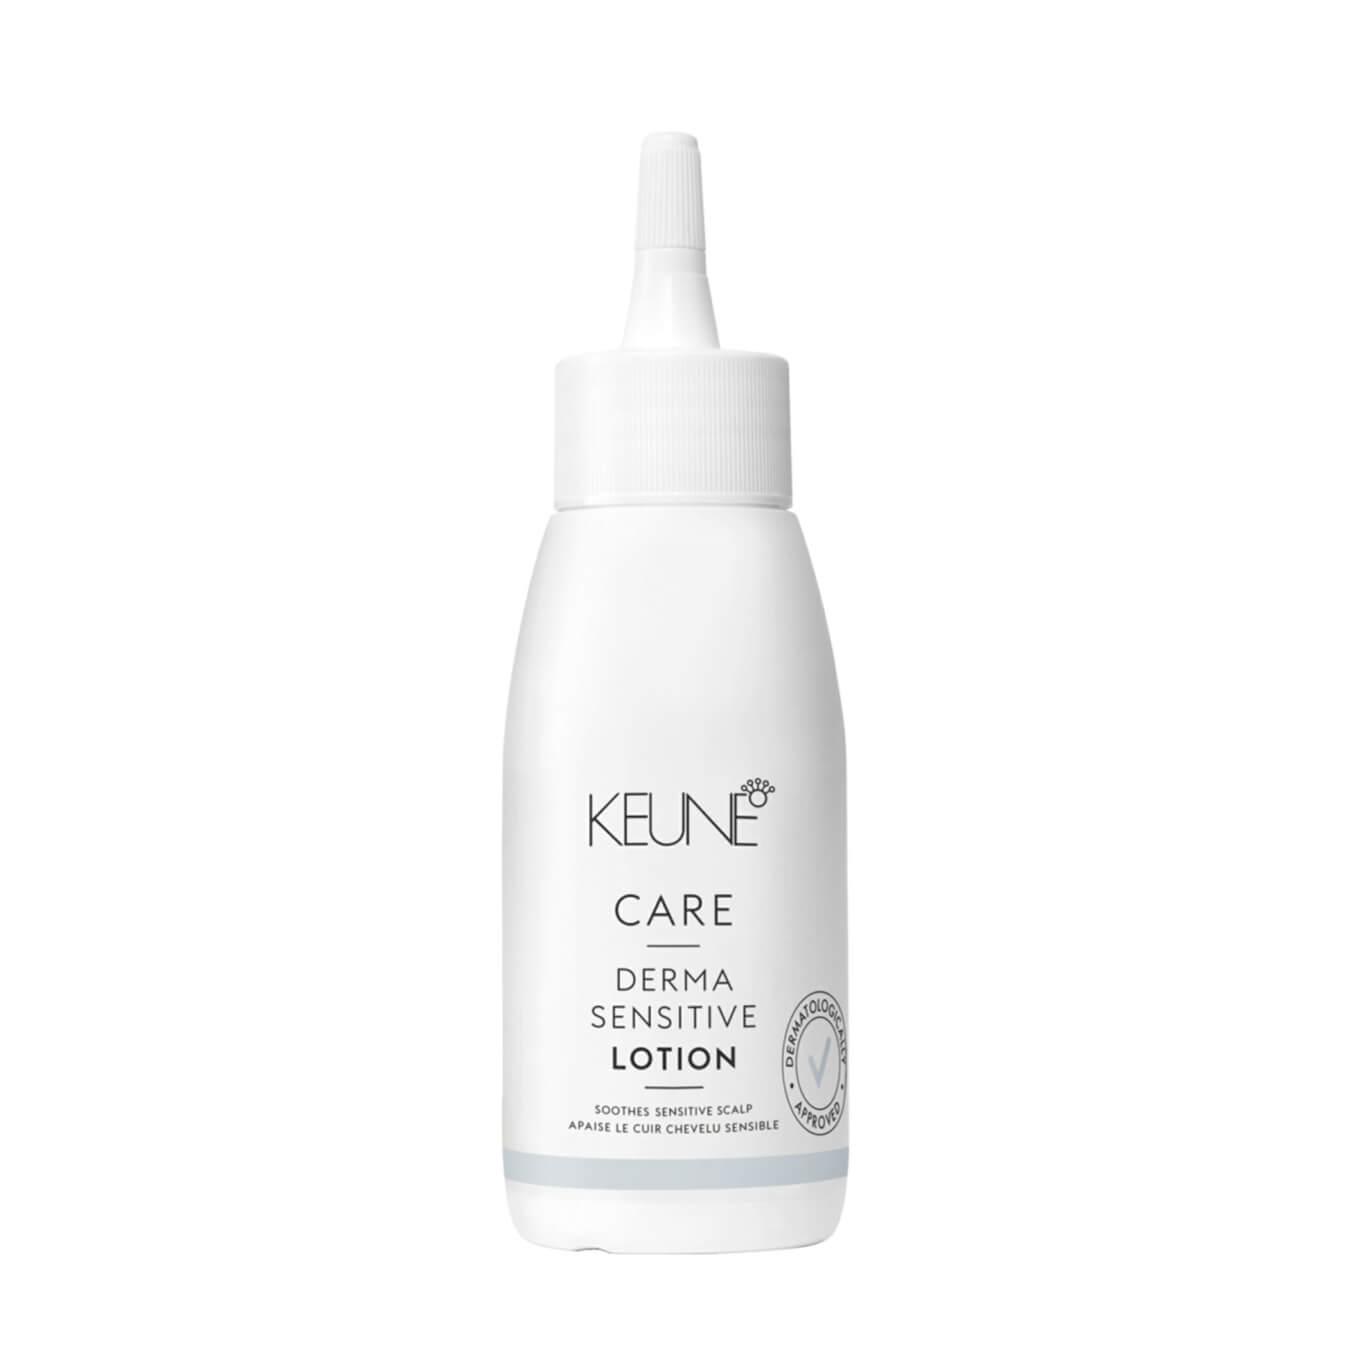 Koop Keune Care Derma Sensitive Lotion 75ml